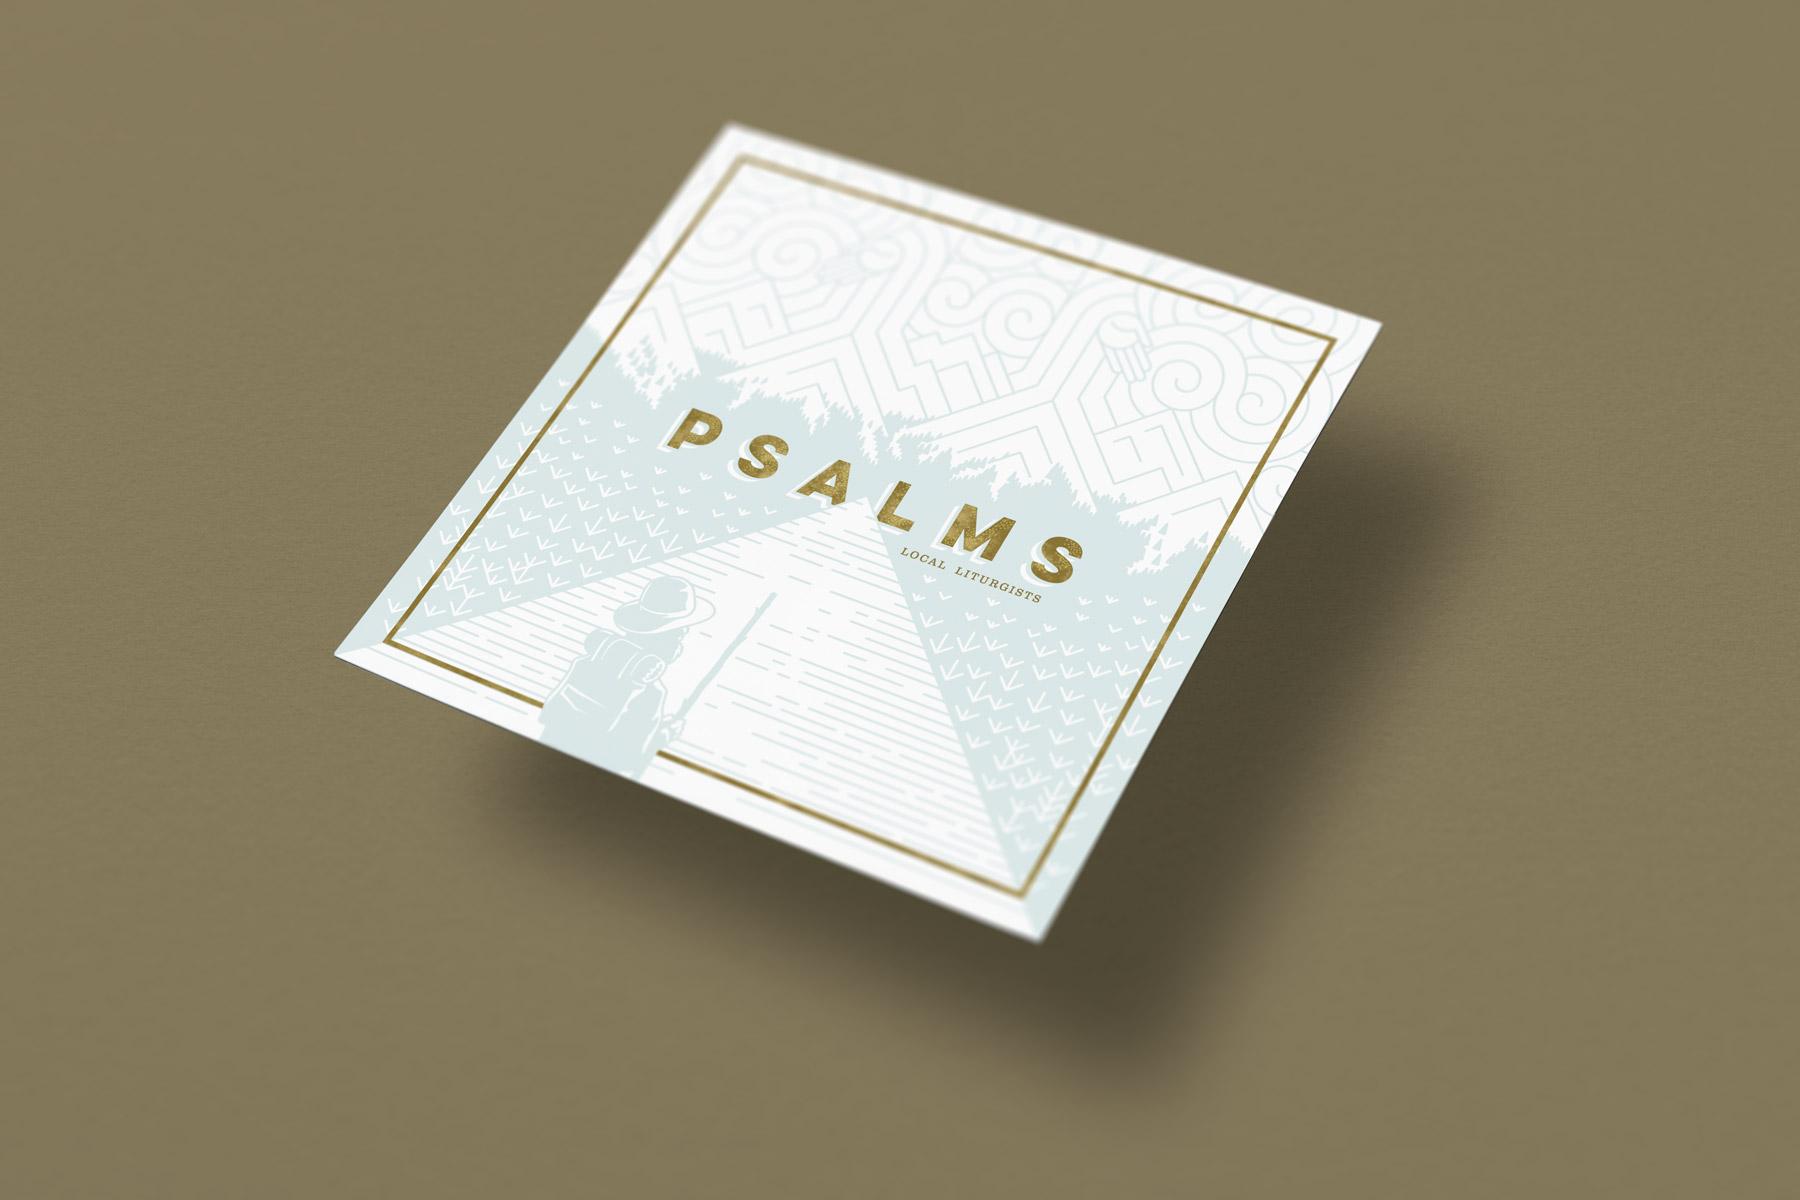 Fellowship Bible Church Pslams Series